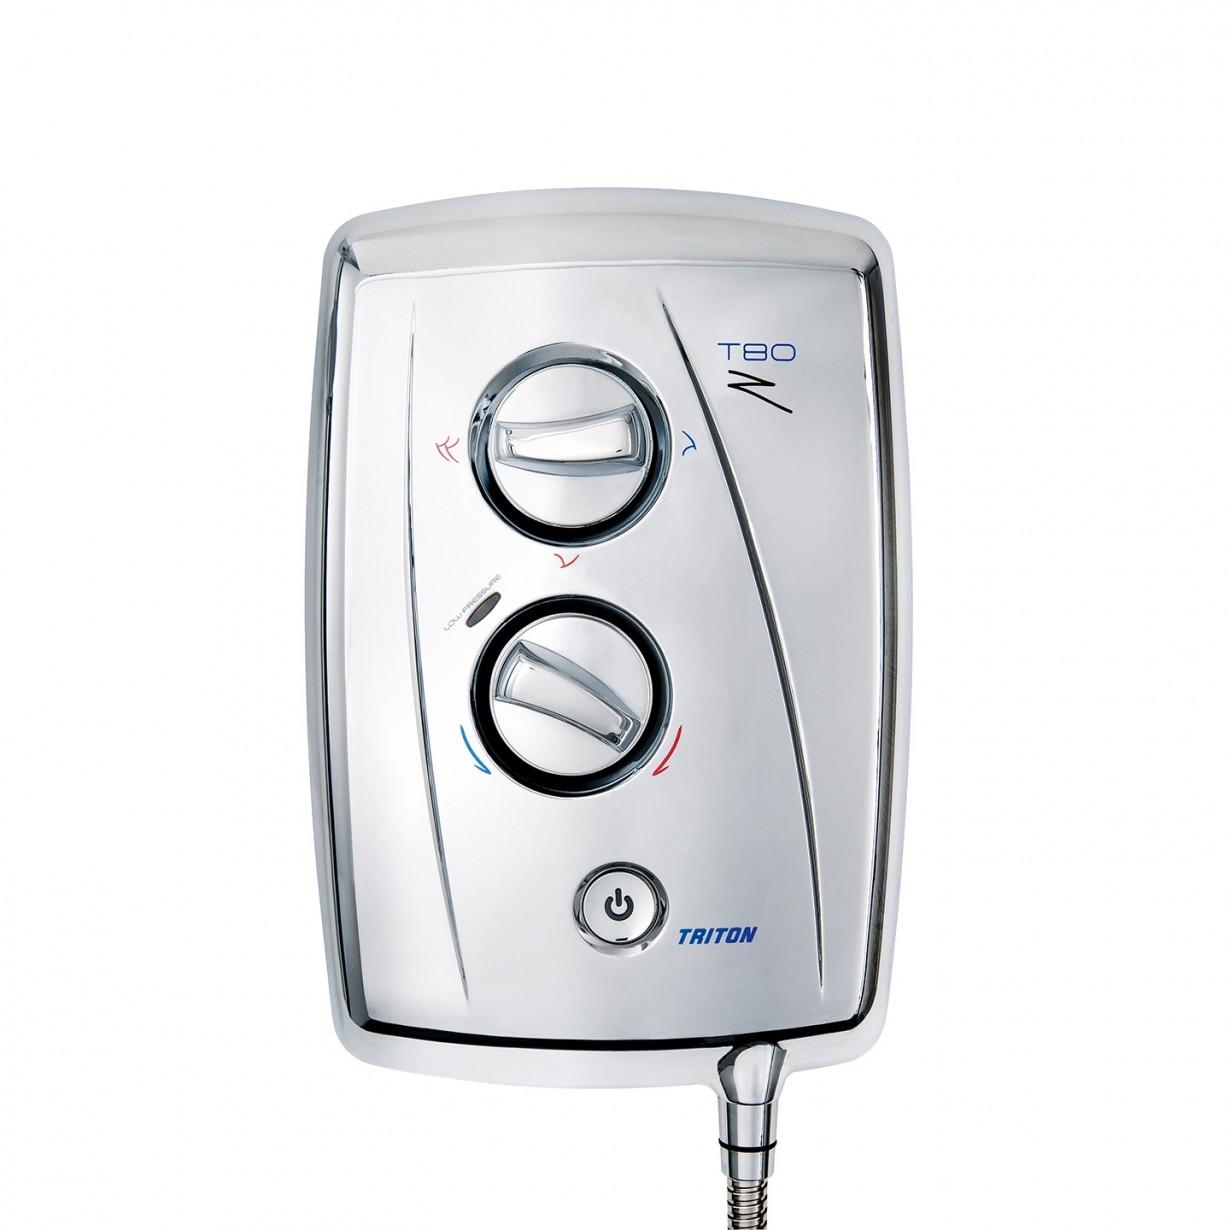 Triton T80Z Fast Fit Electric Shower 10.5KW - Chrome